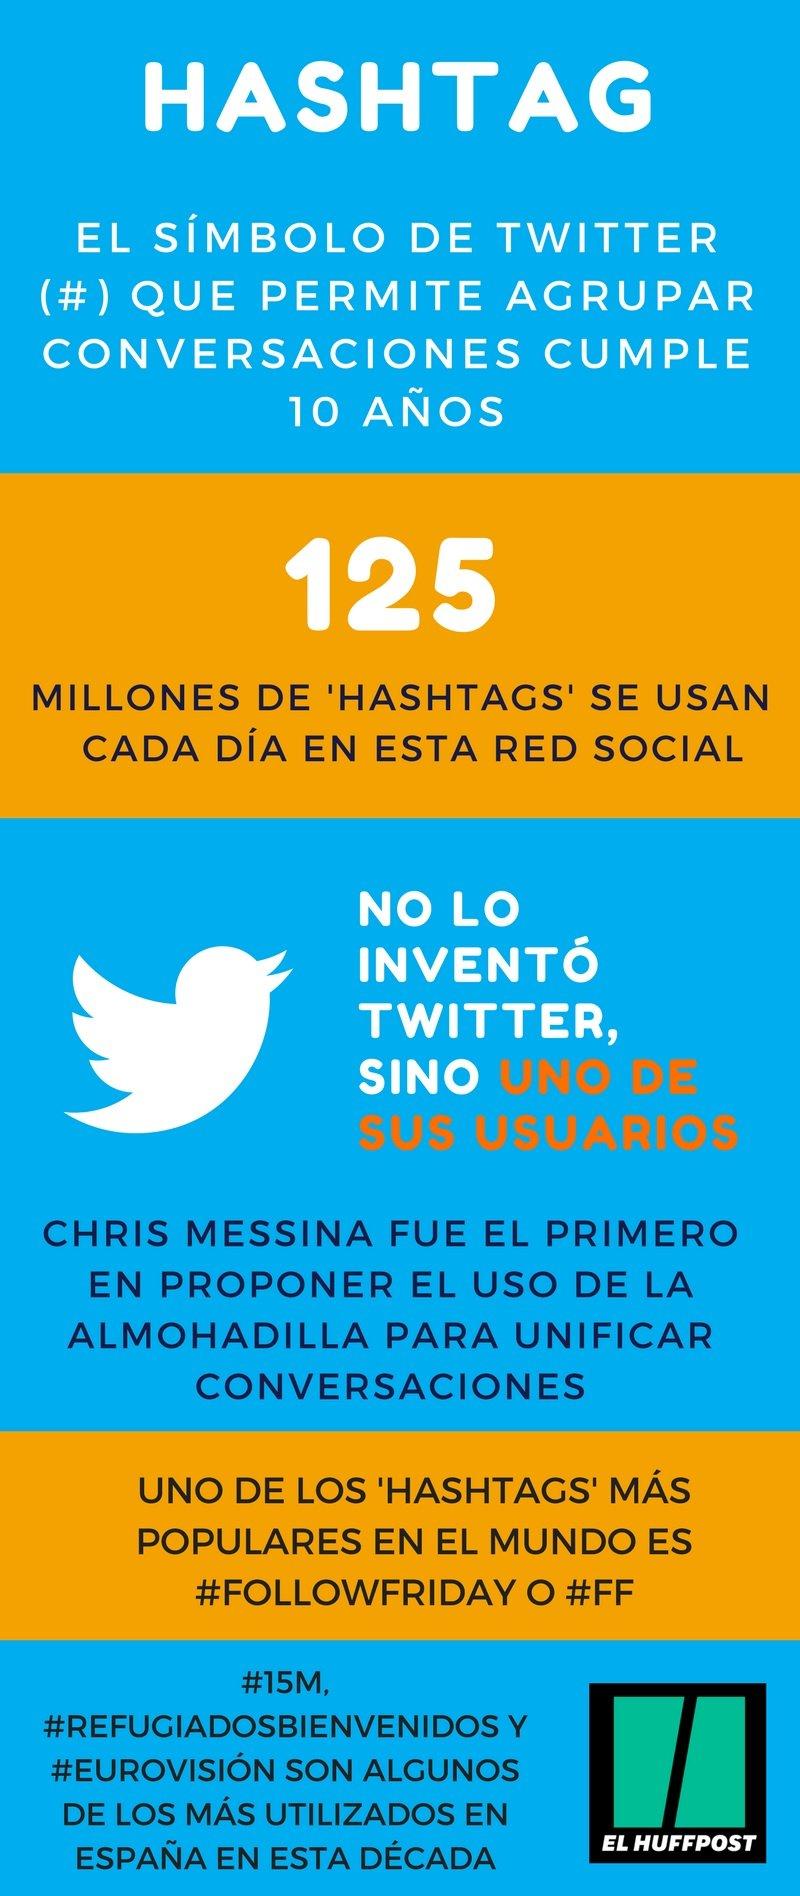 La idea ha evolucionado: hoy, de promedio, se comparten a diario 125 millones de hashtags en Twitter.